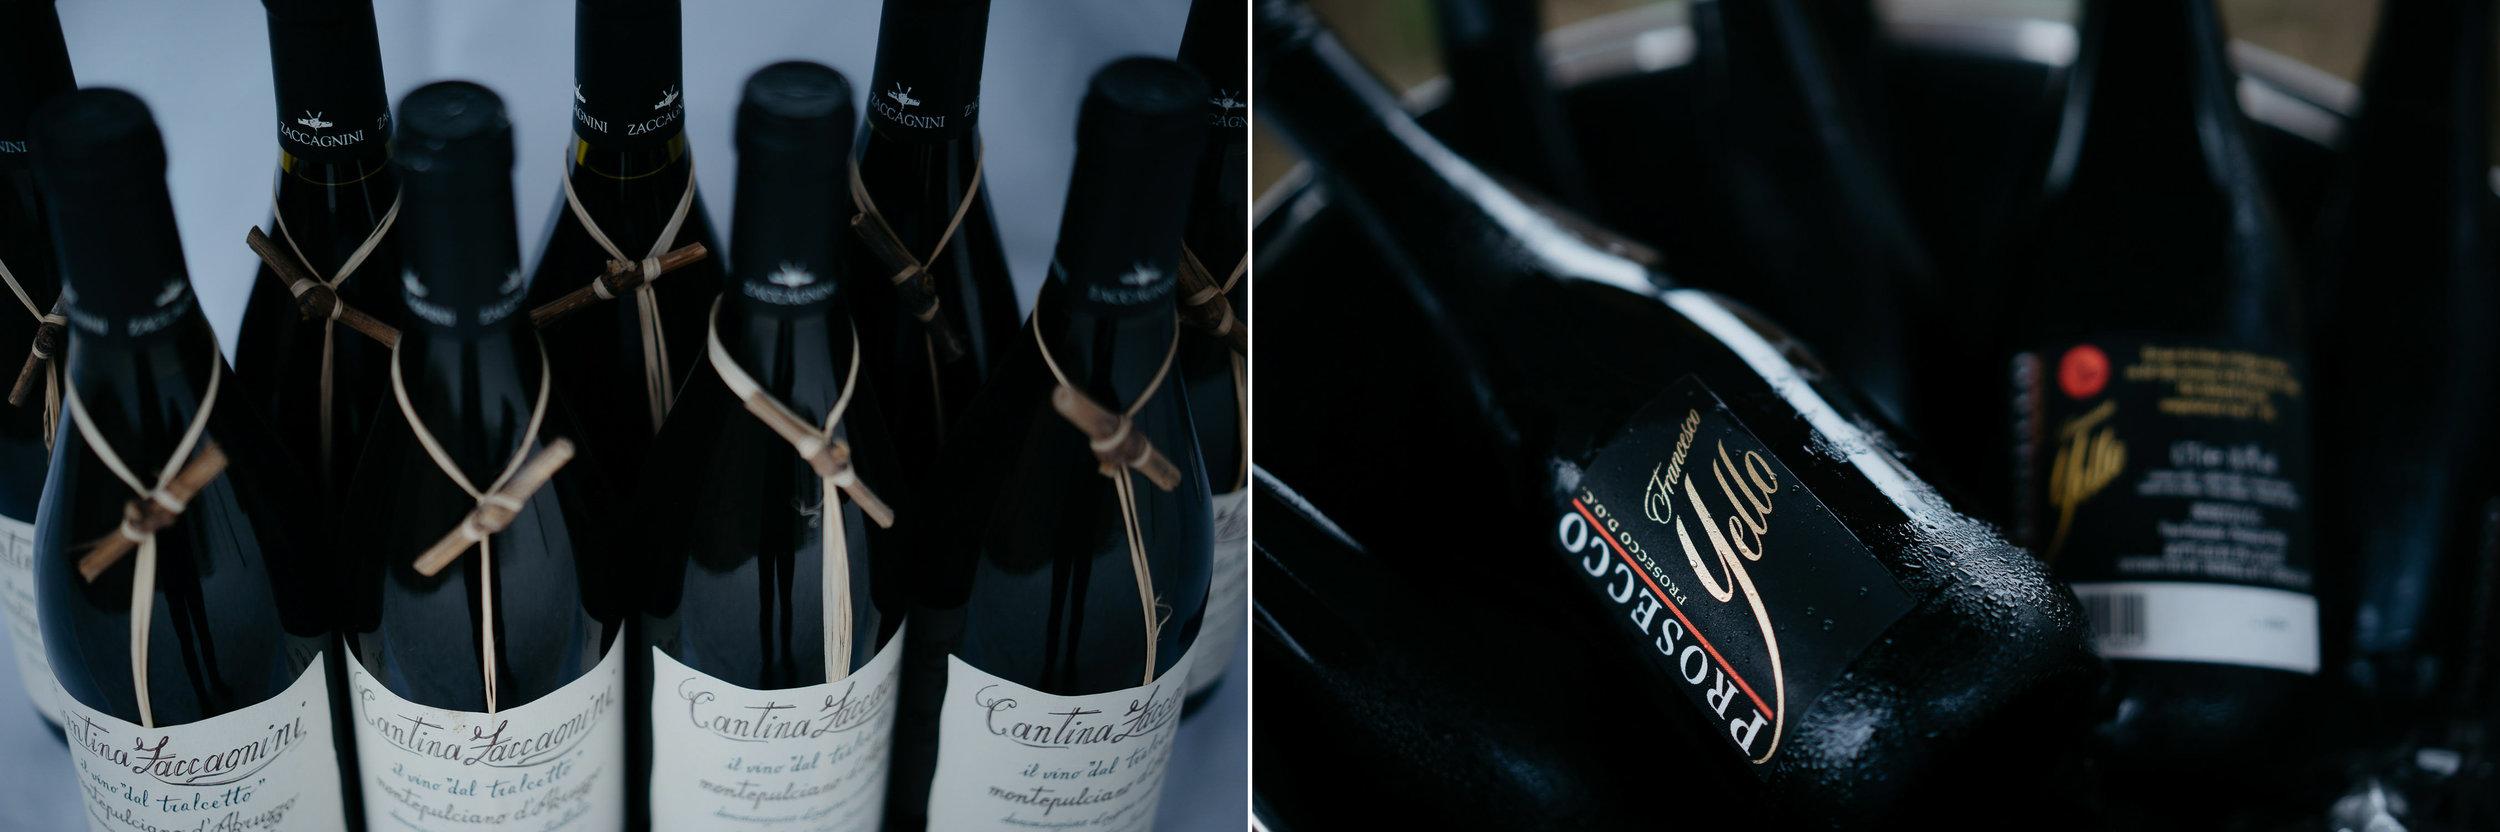 wedding photography details yello wine